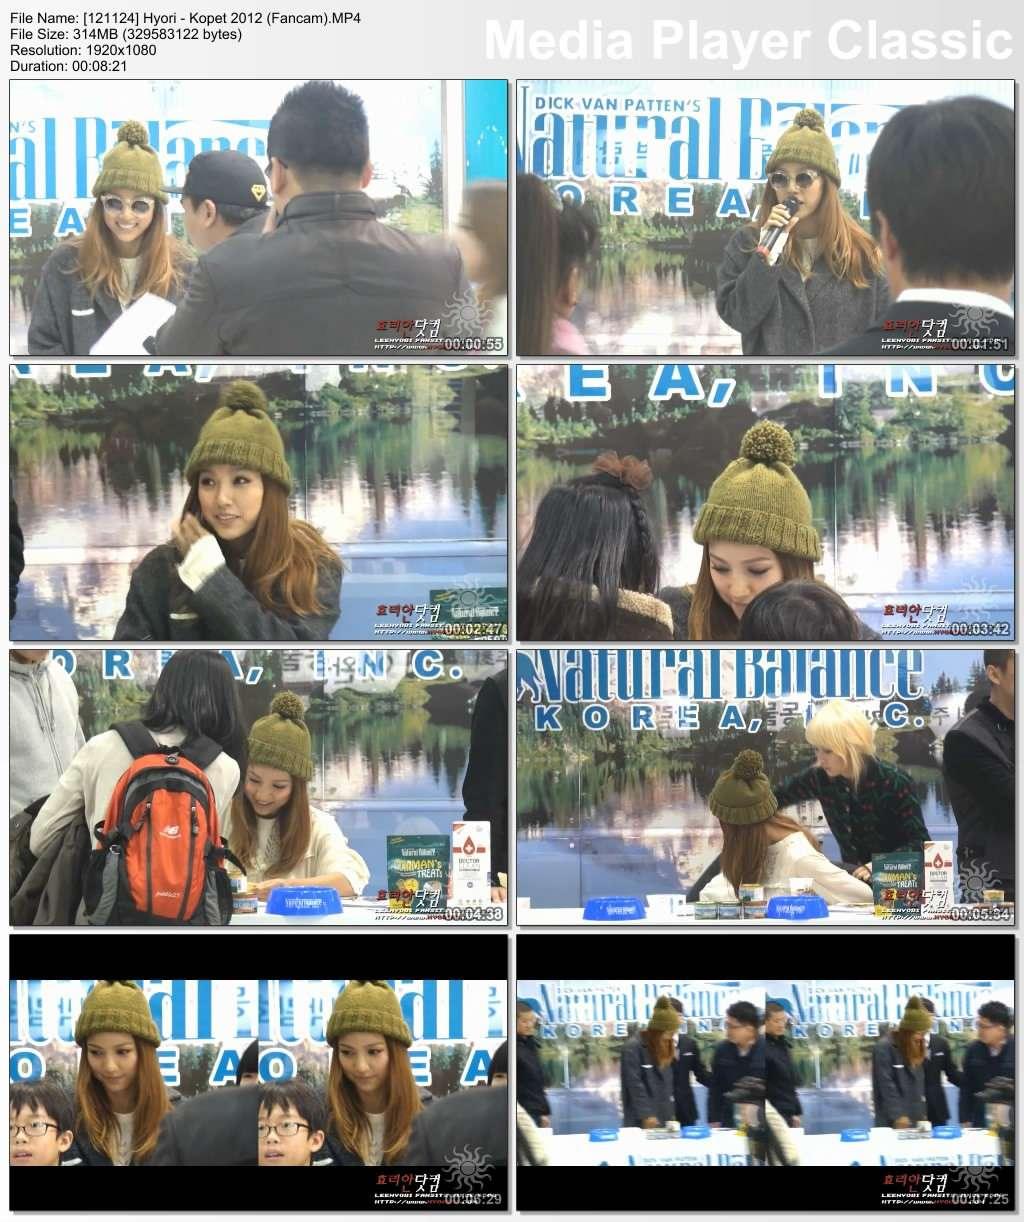 [121124] Hyori - Kopet 2012 (Fancam) 12112410